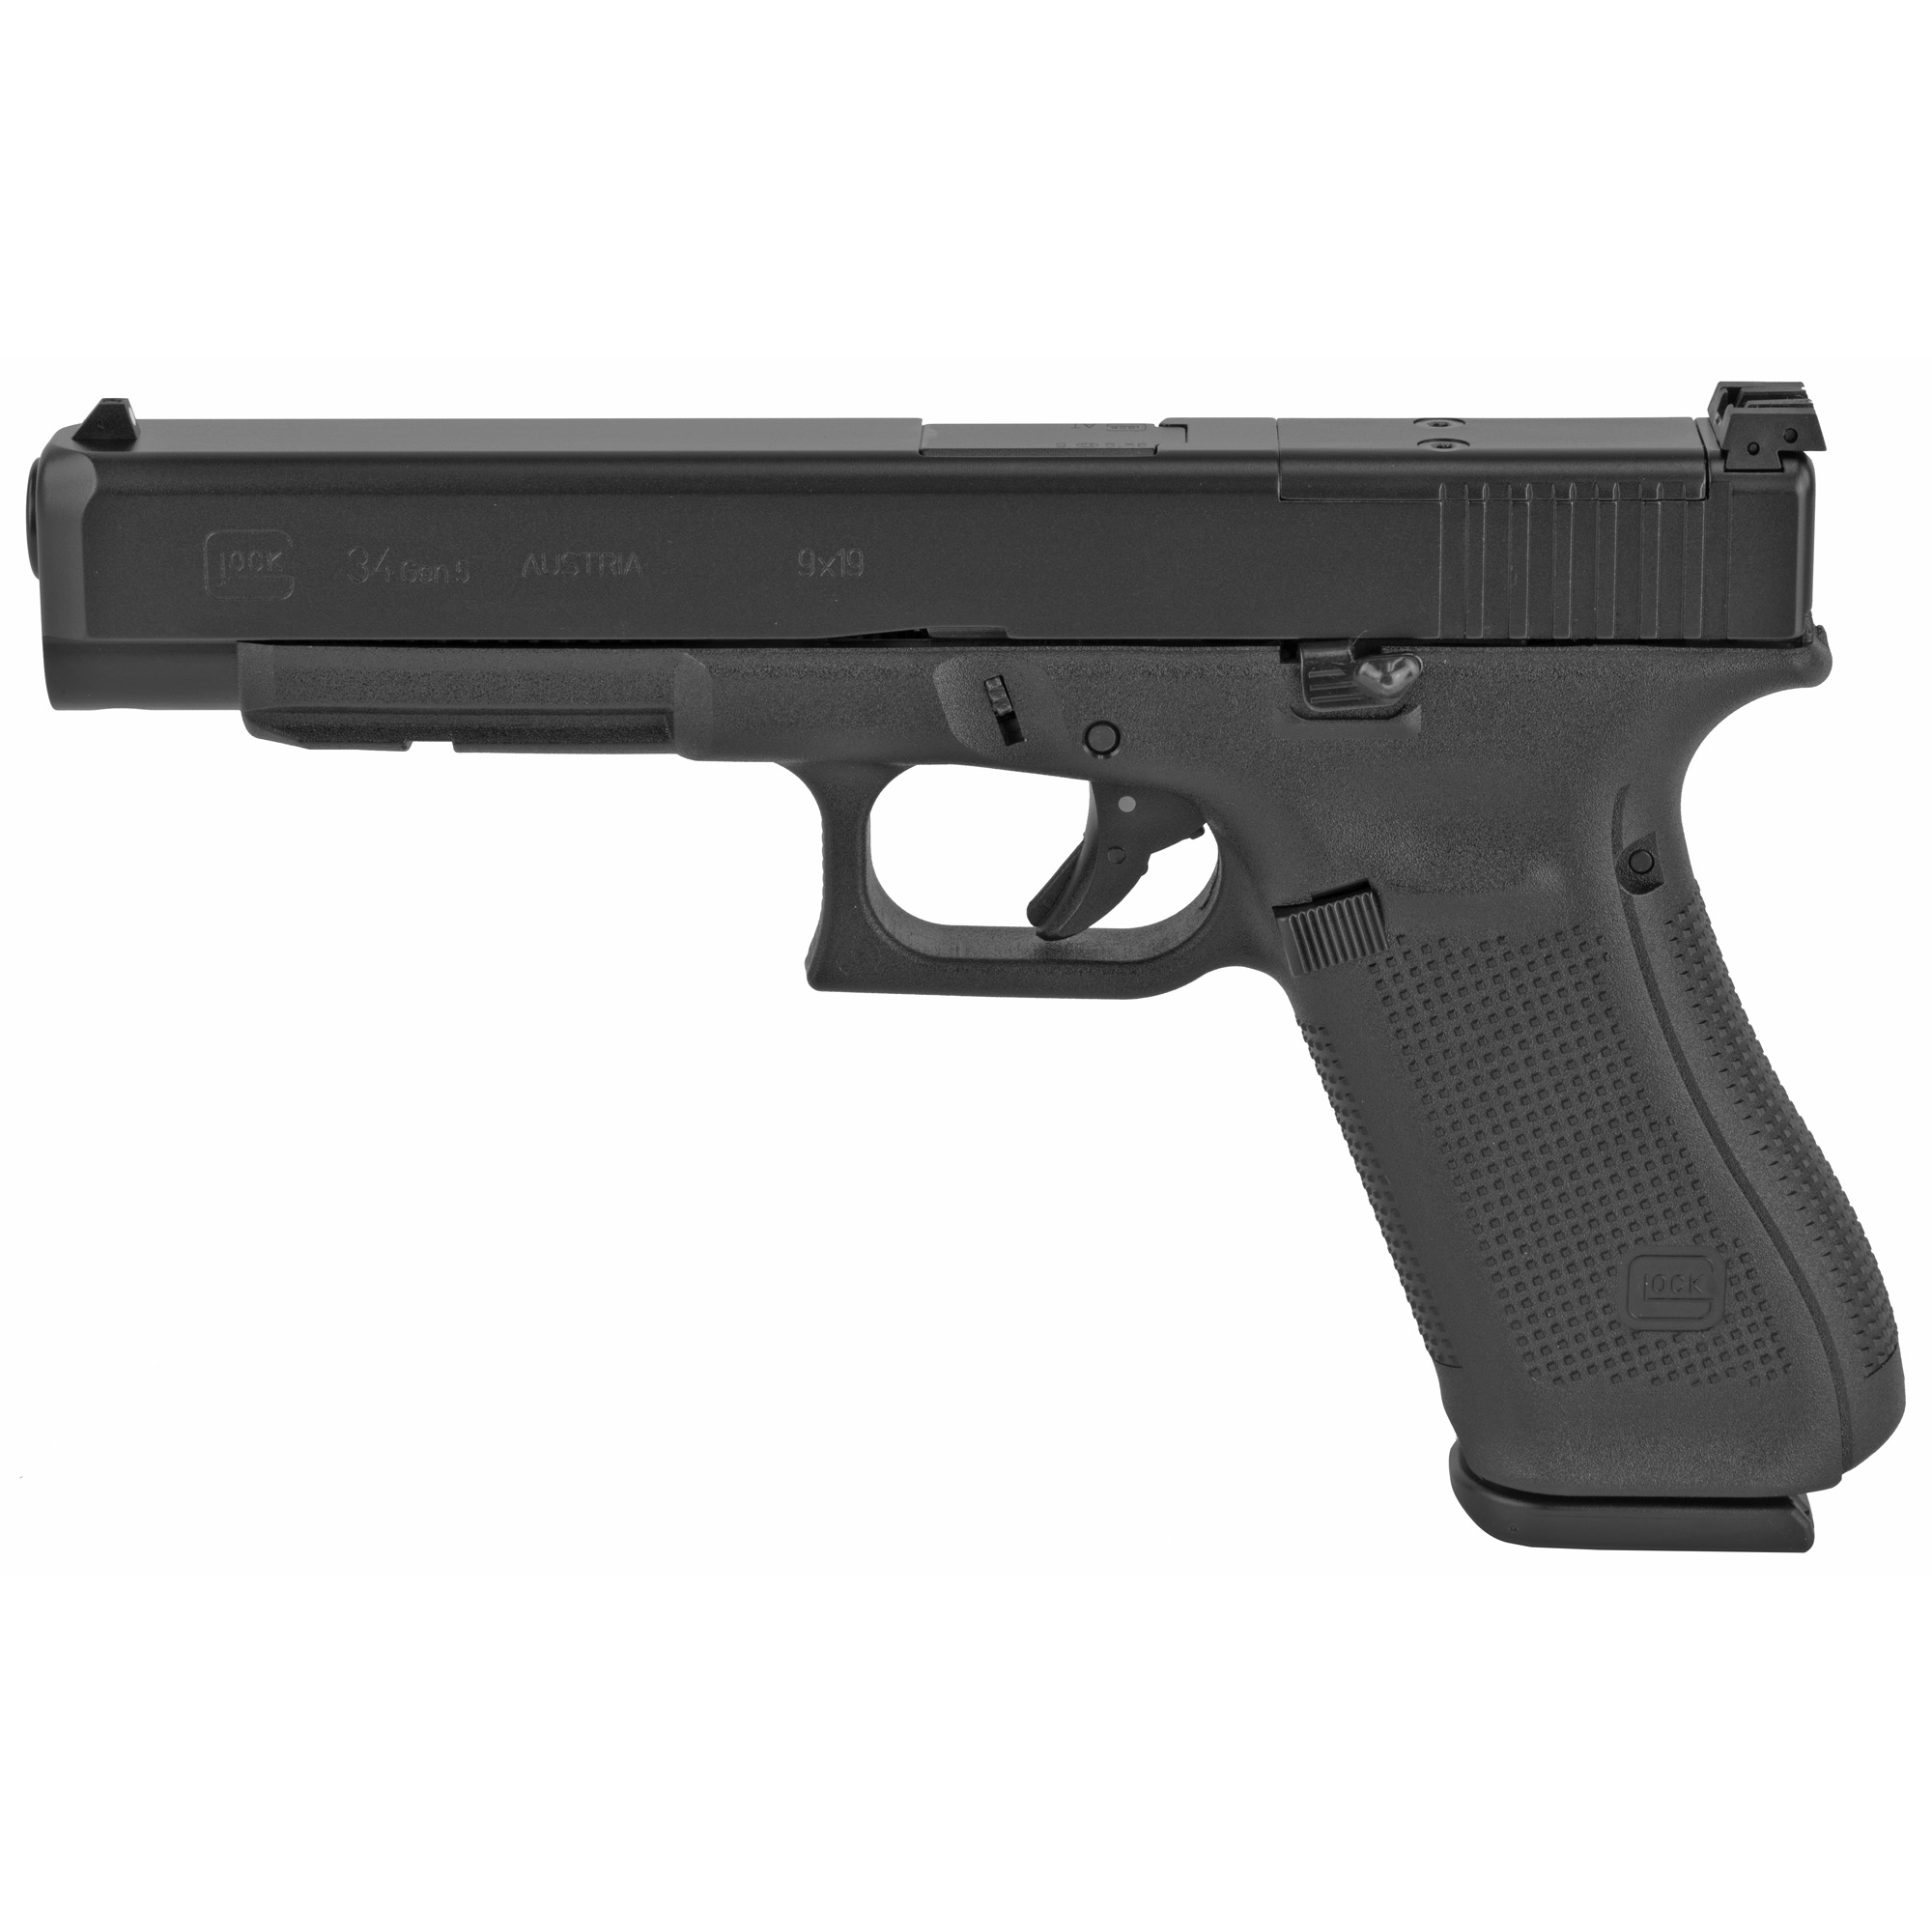 Glock 34 Gen5 9mm 17rd Mos Rebuilt